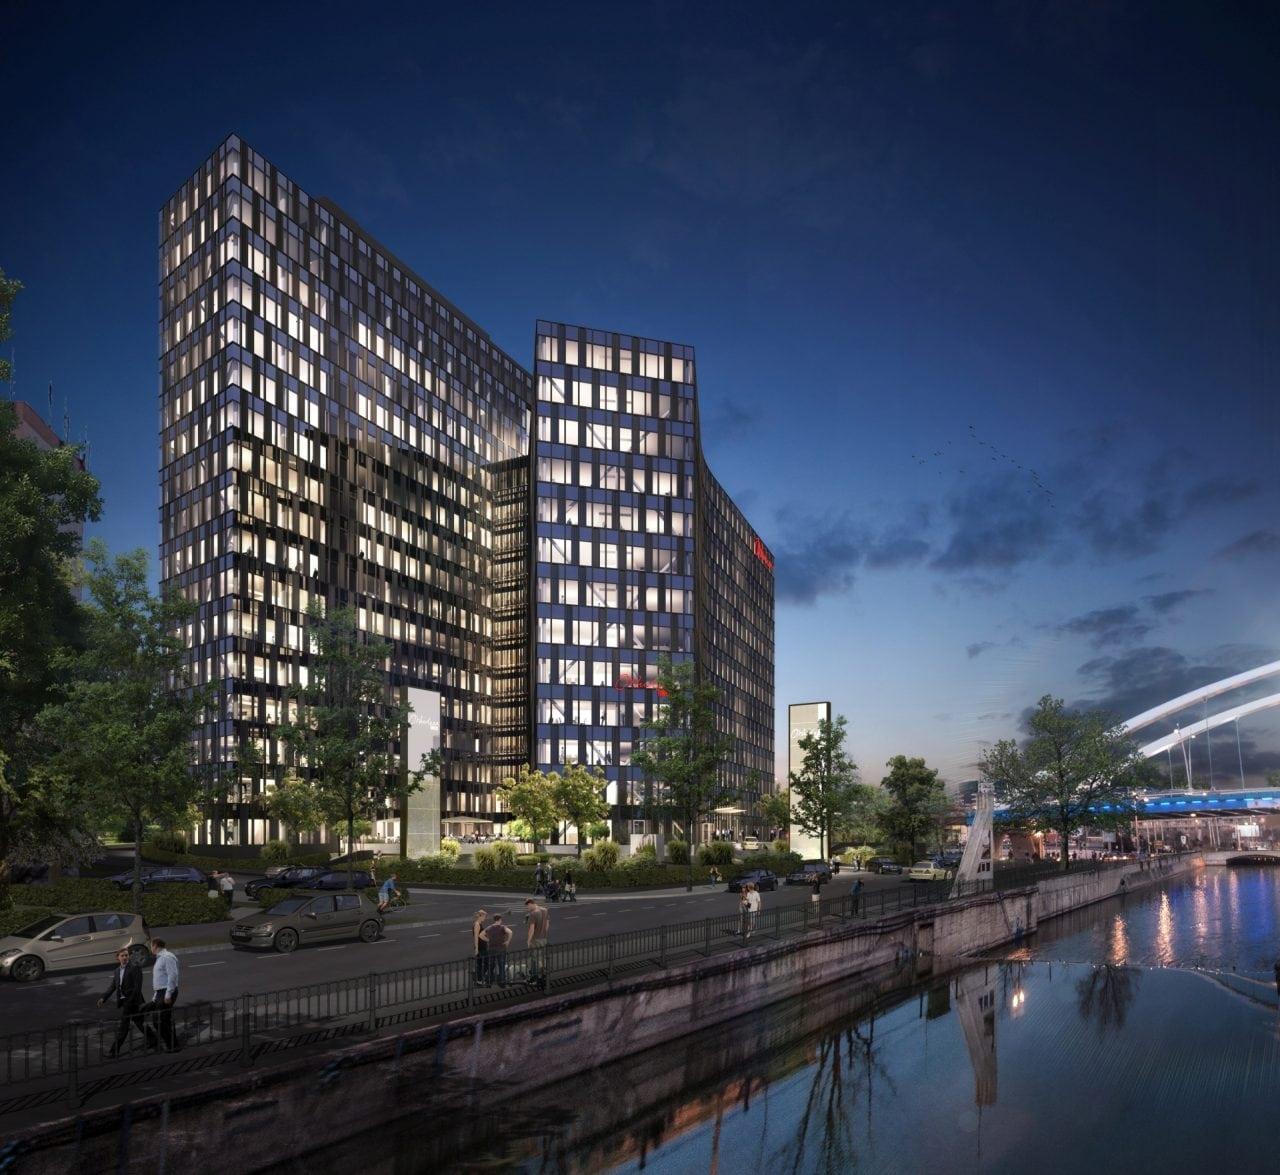 Bukarest-Büro-Orchidea-Towers-Visualisierung-Nacht